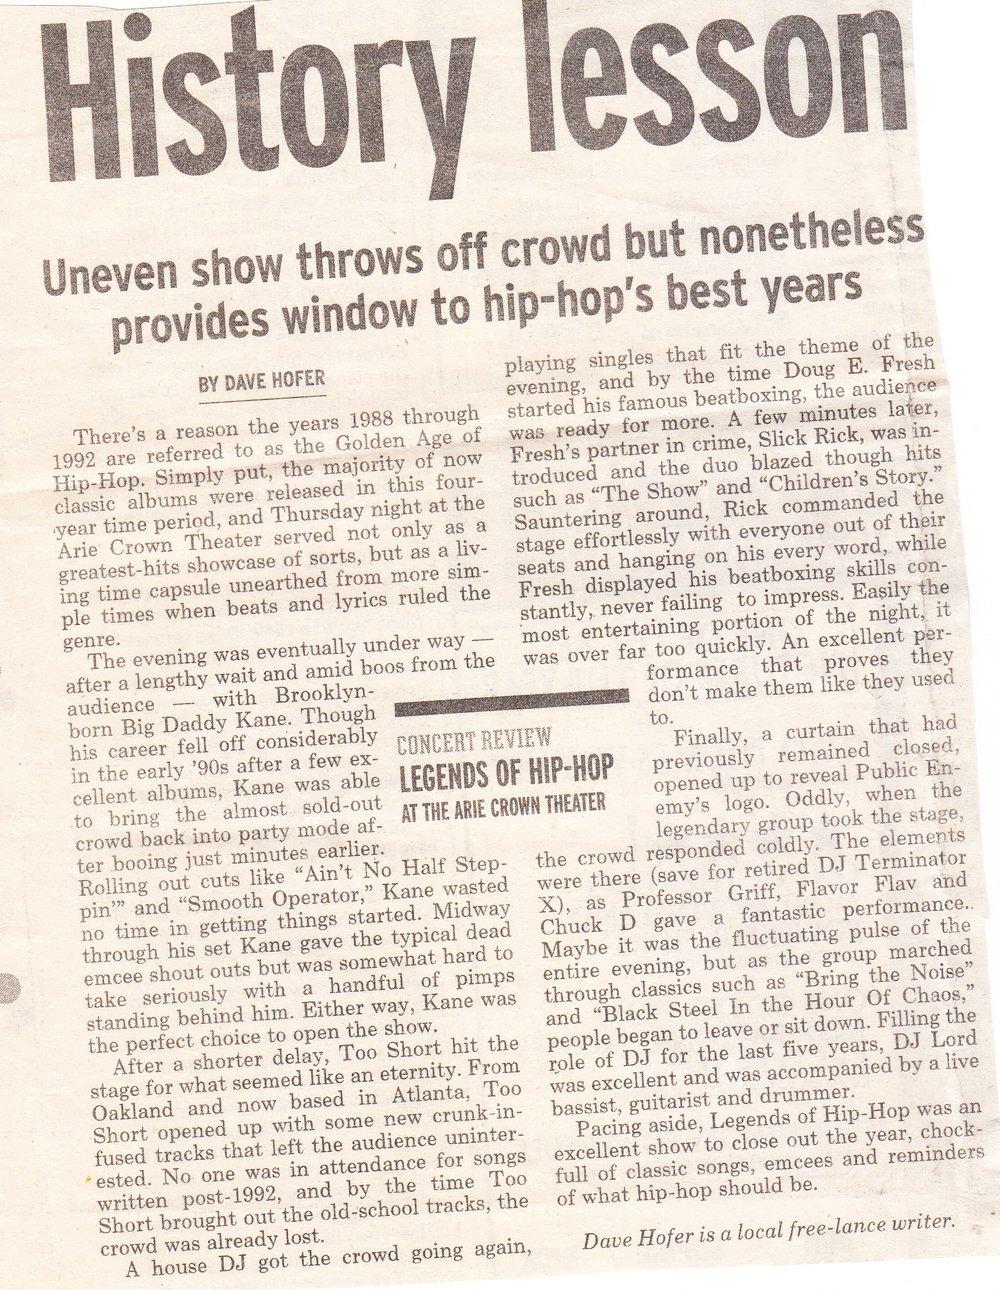 legends_of_hip_hop.jpg